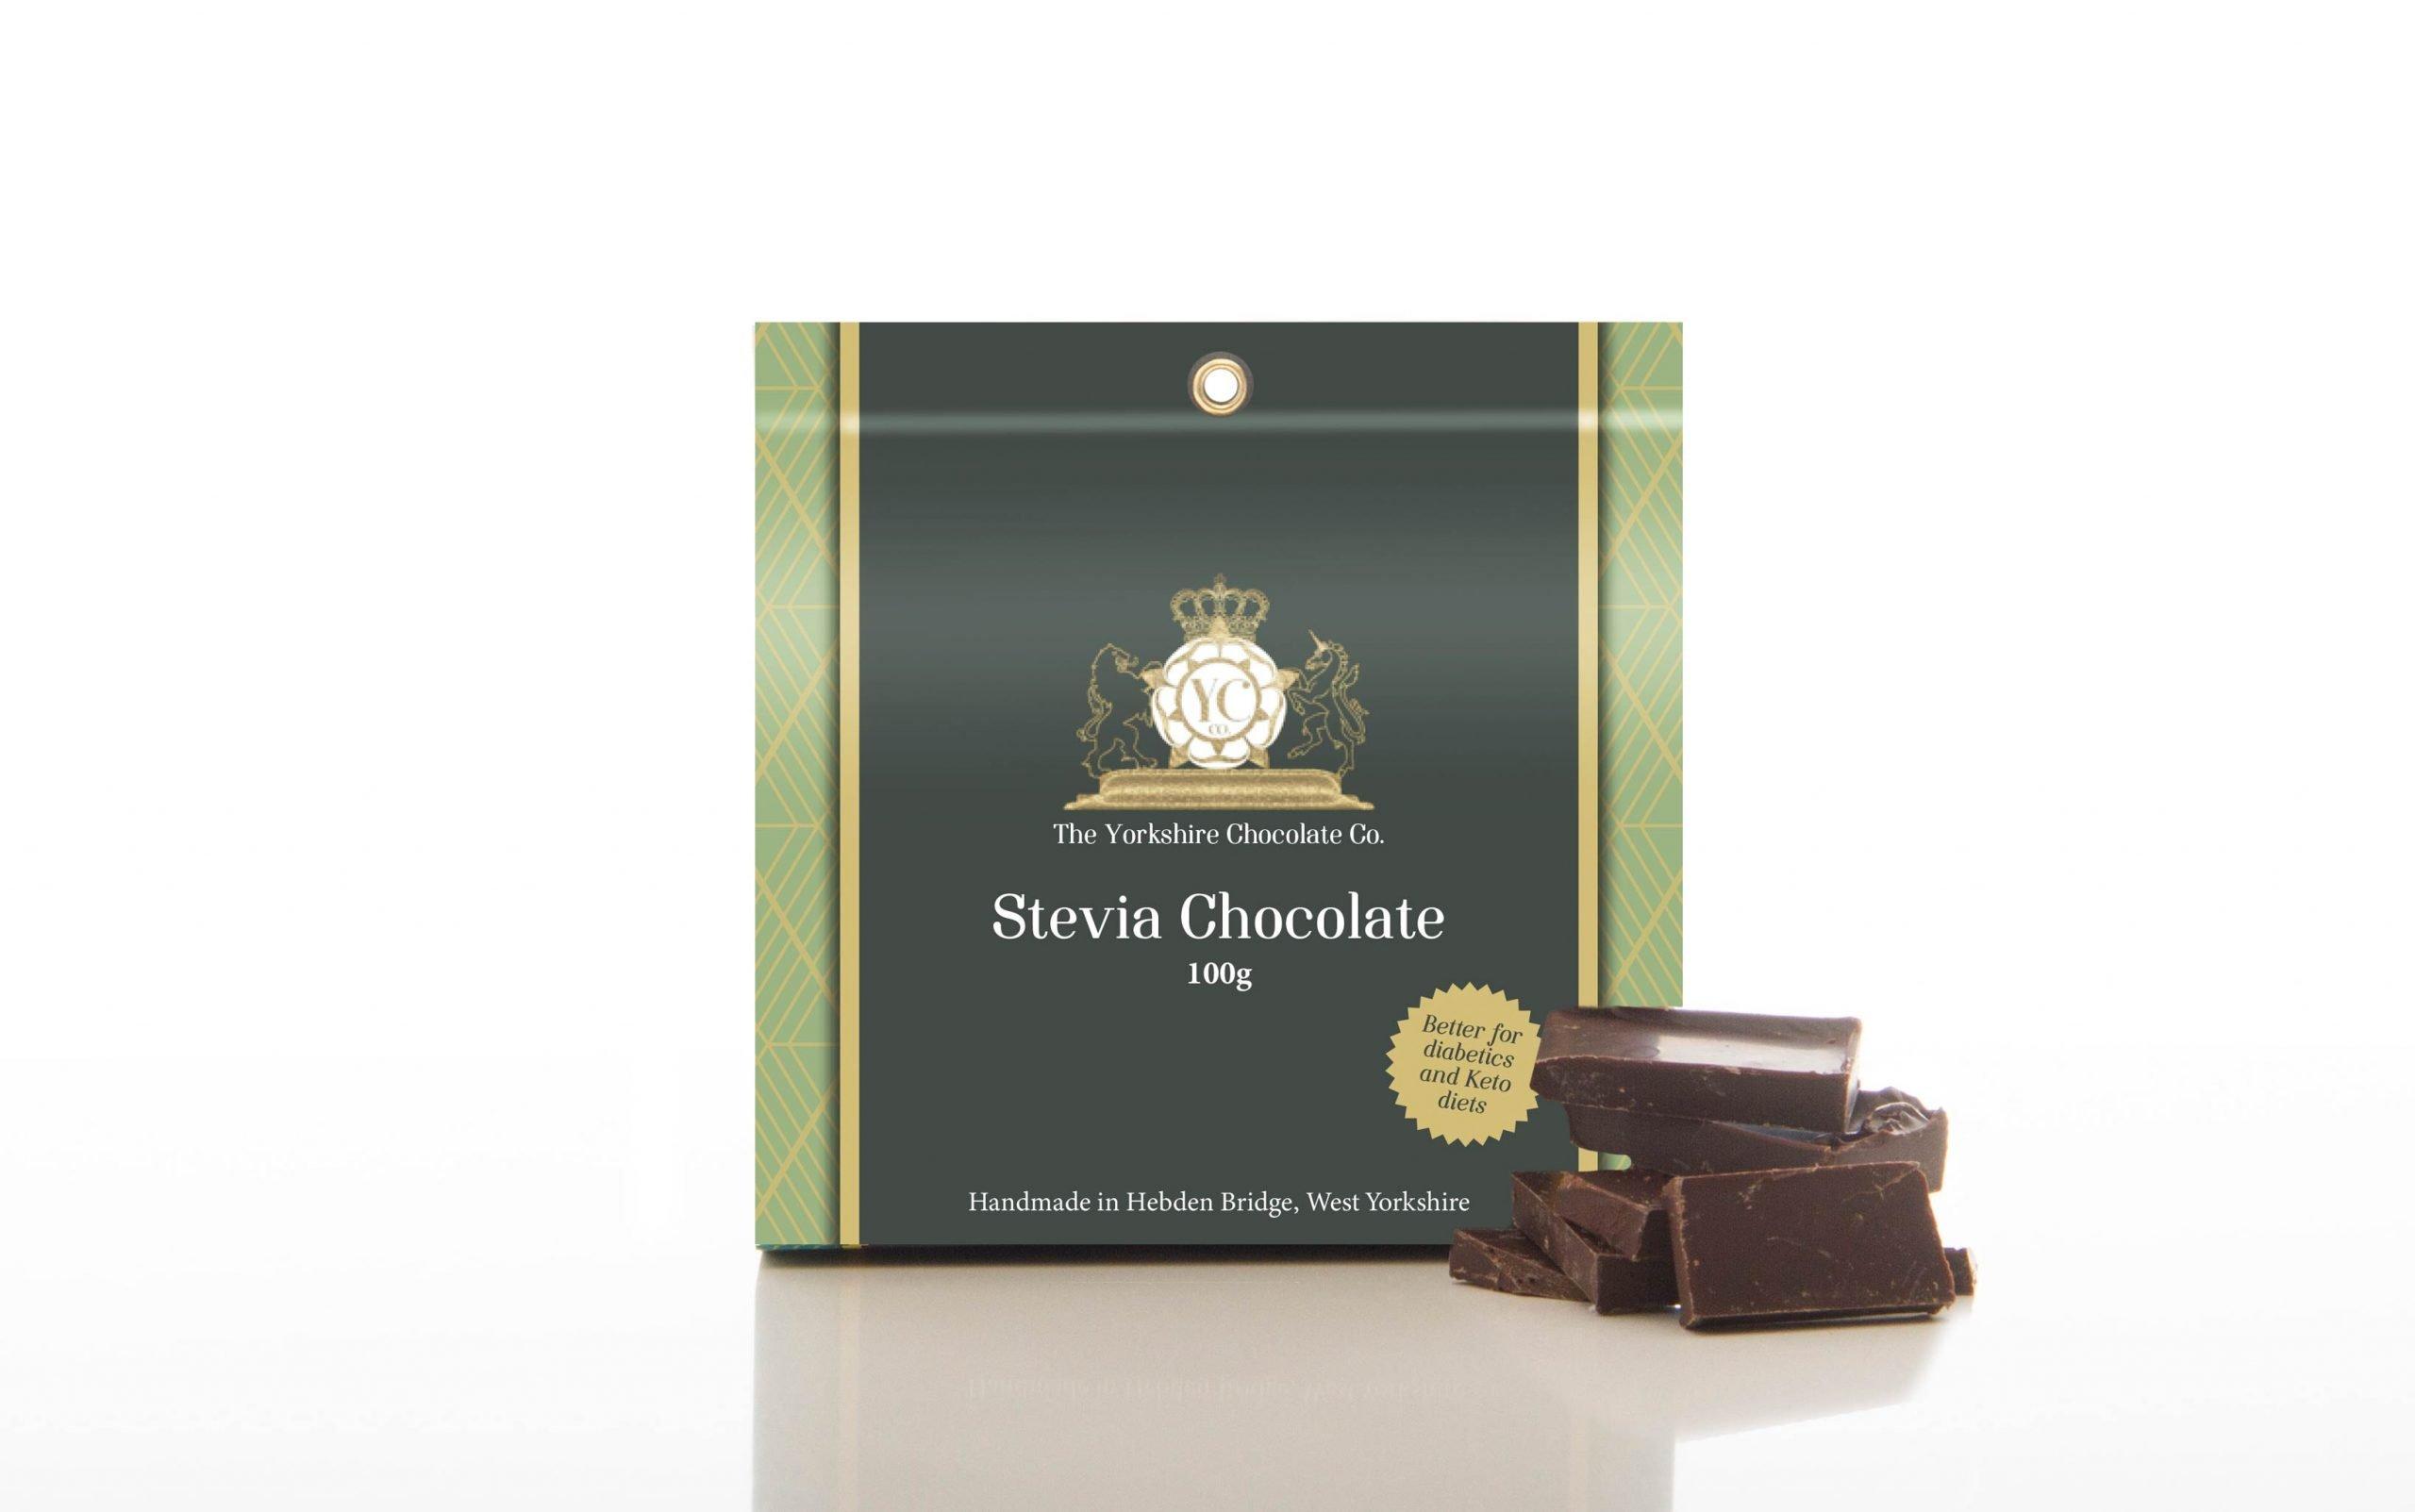 Box of Stevia Chocolate